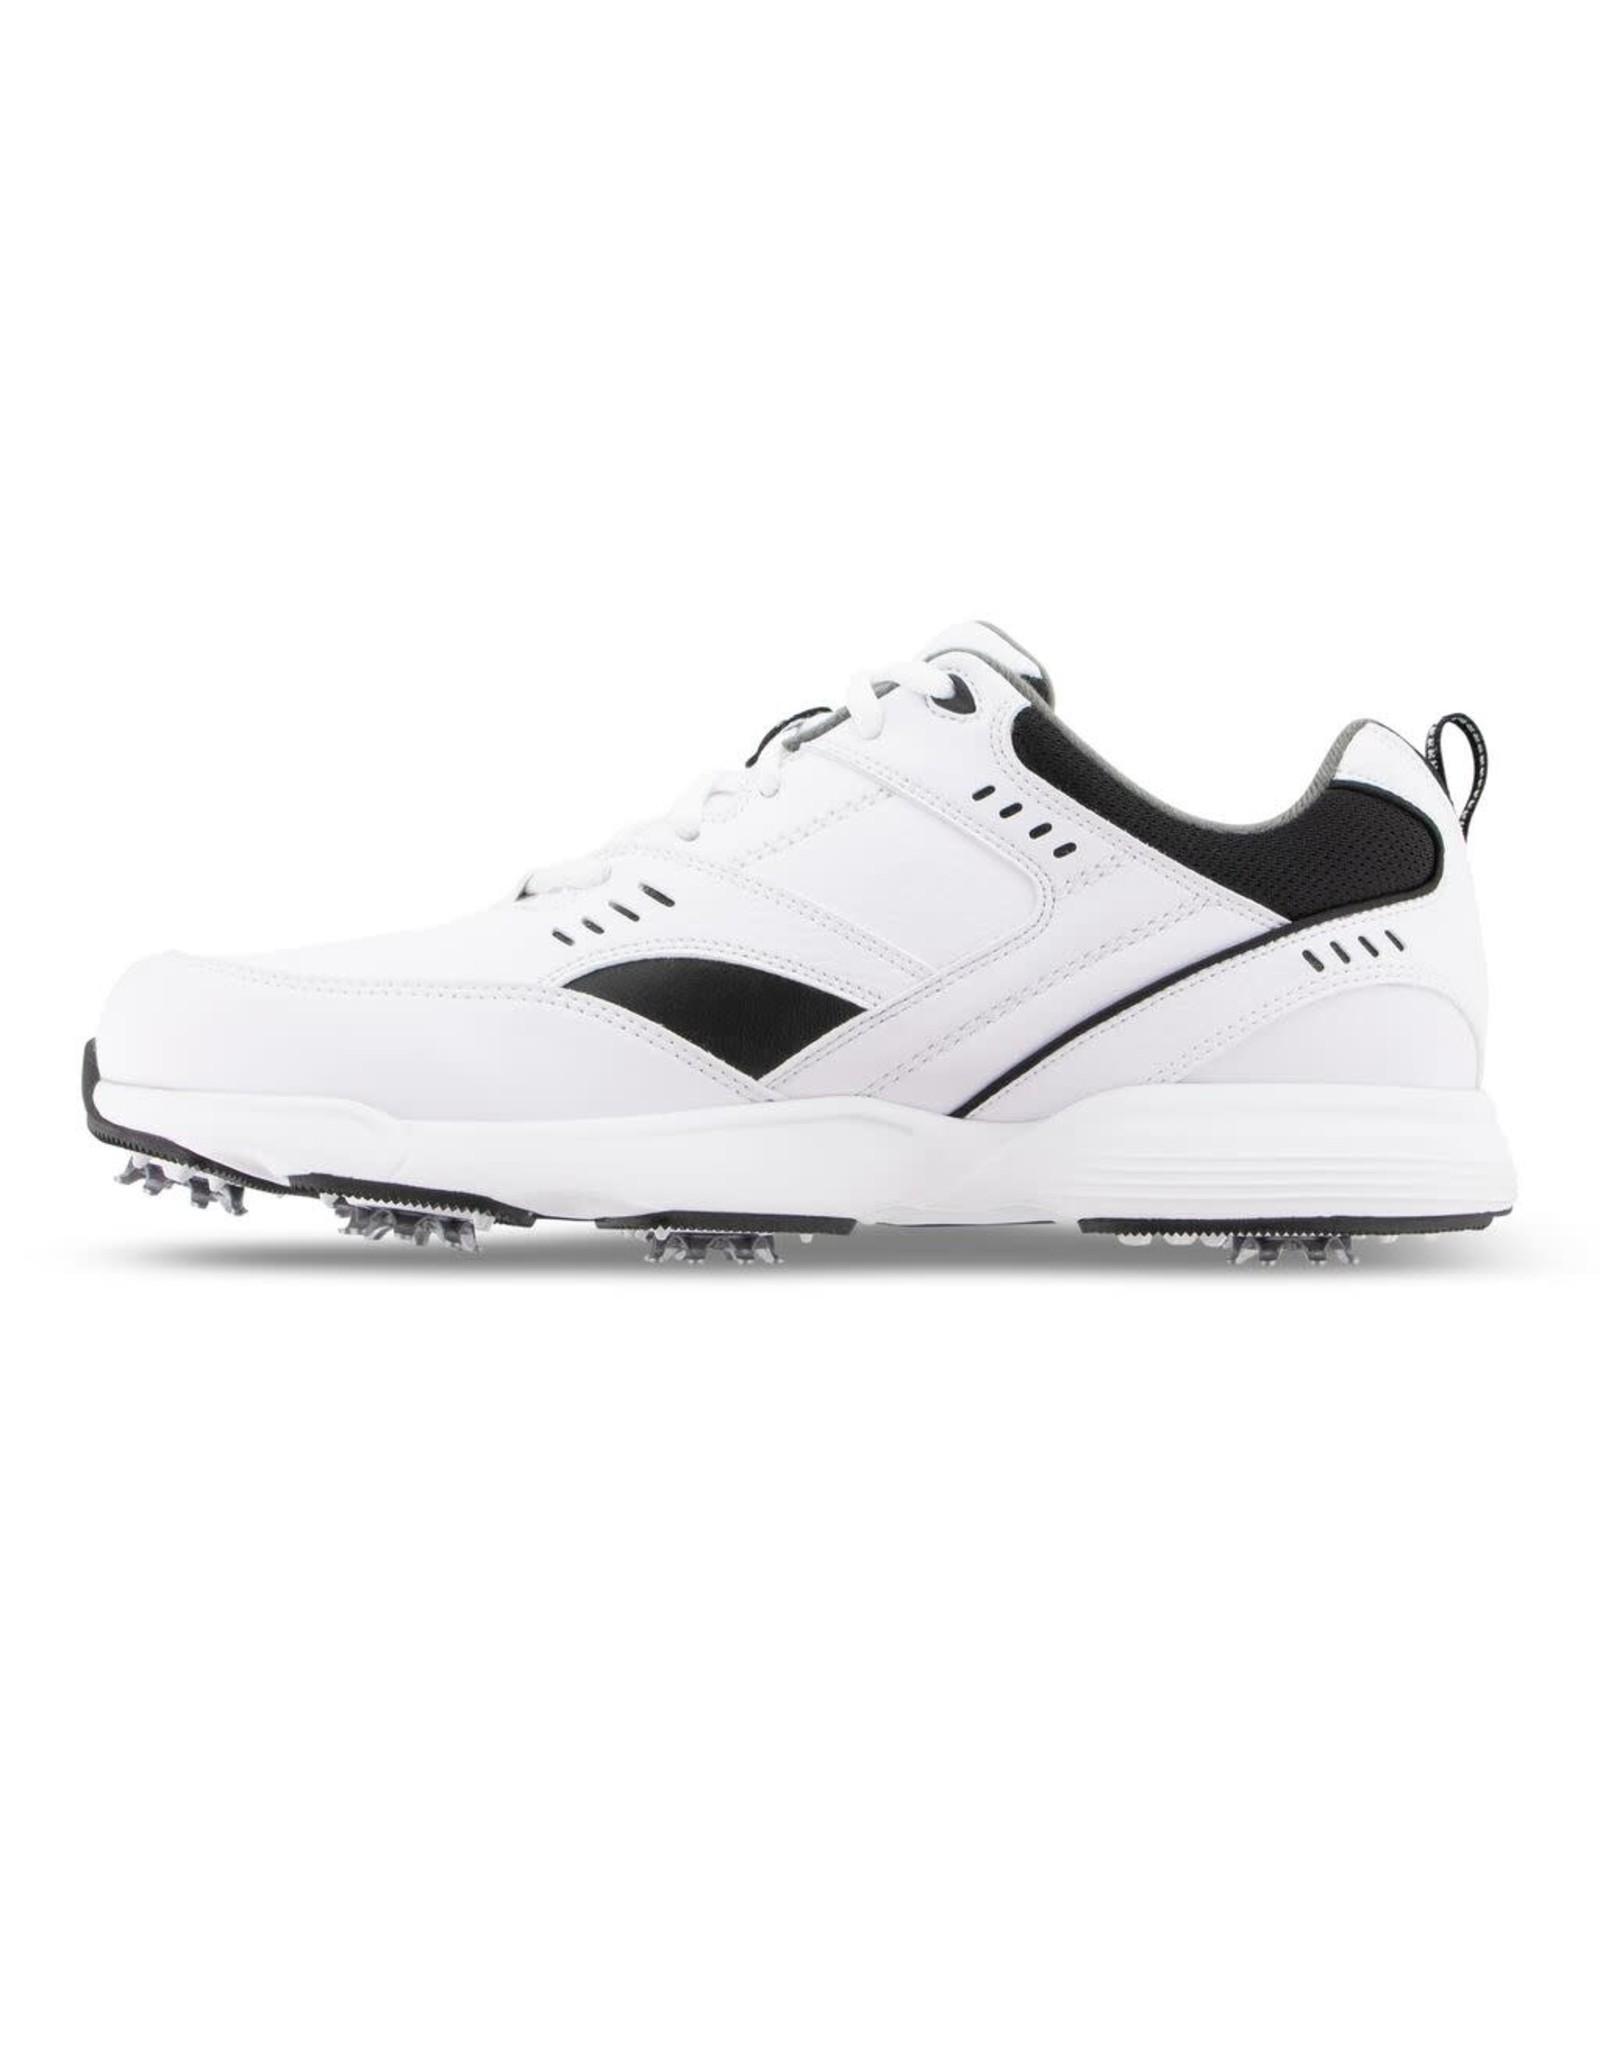 FJ FJ Golf Sneaker White